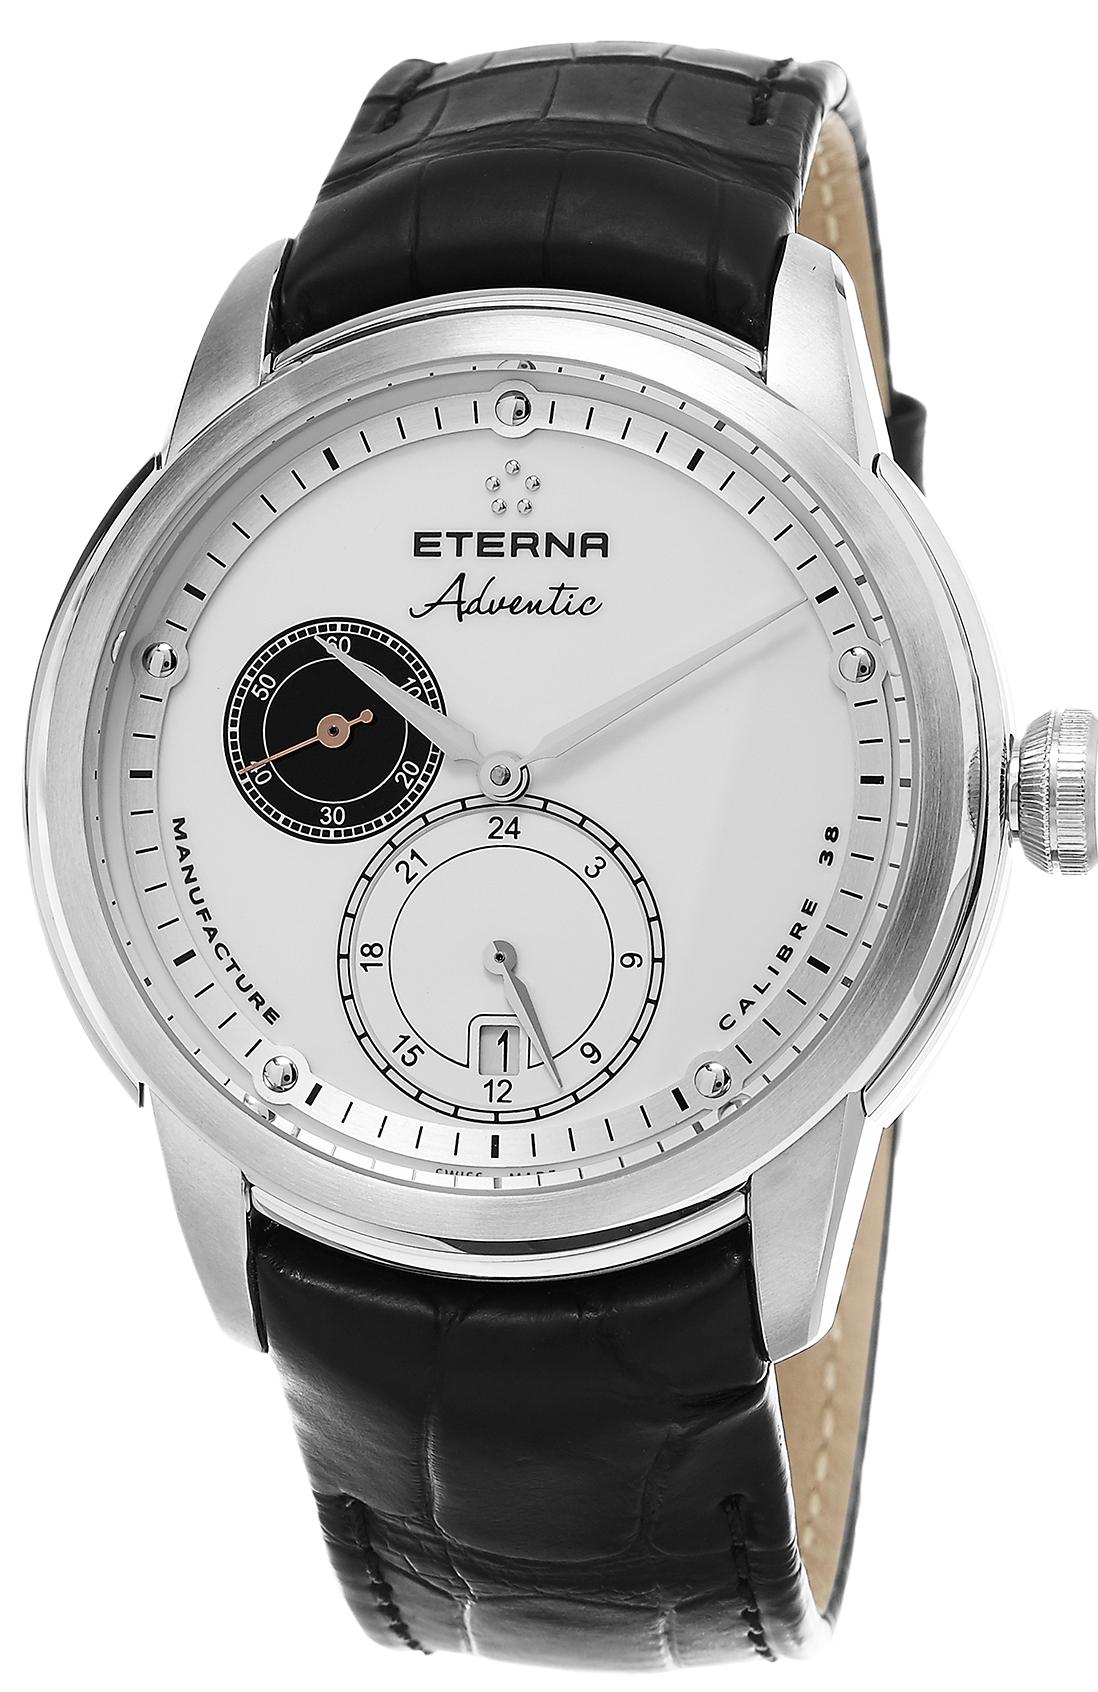 Image of Eterna Adventic Mens Watch Model 7660.41.66.1273